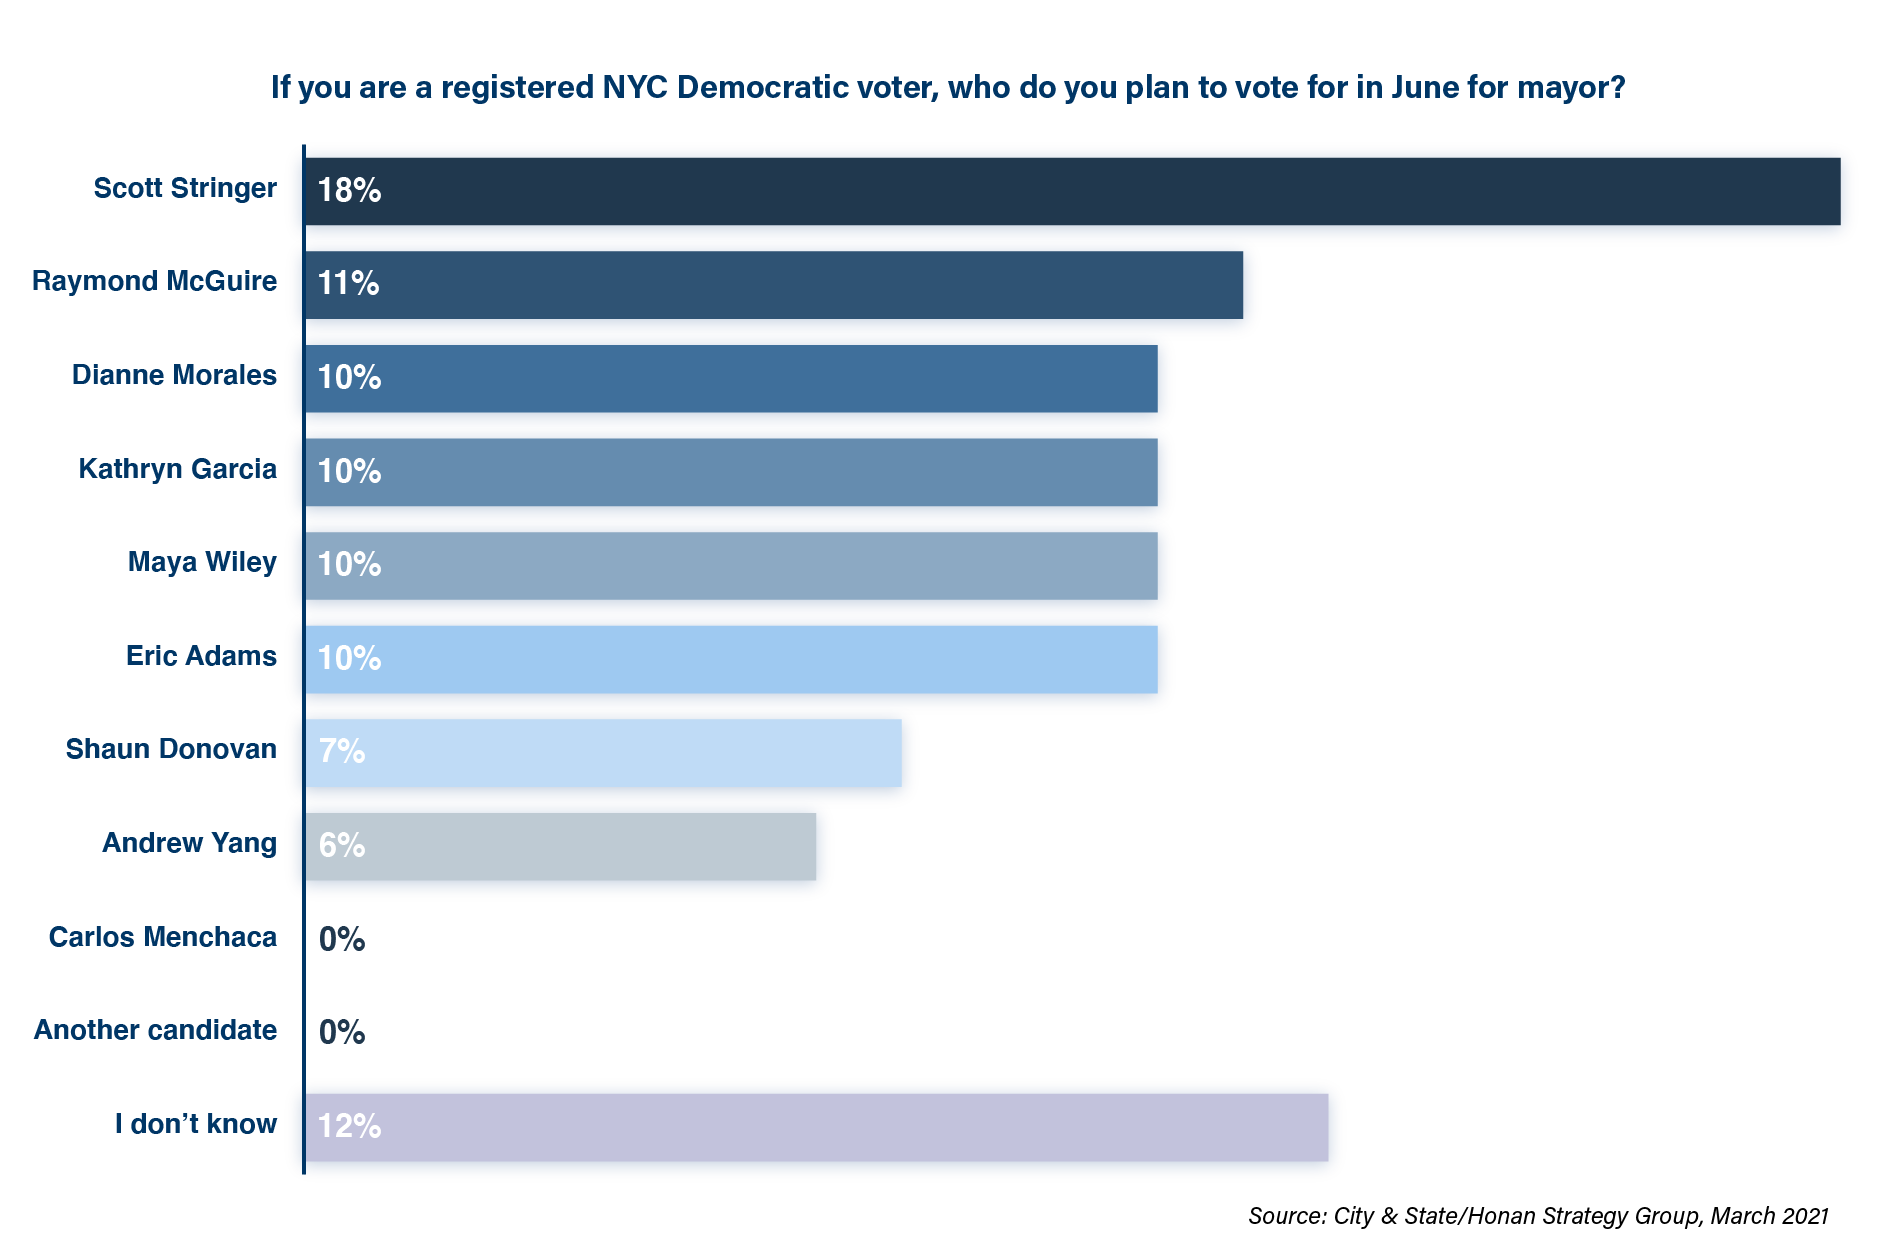 City & State + Honan Strategy Poll